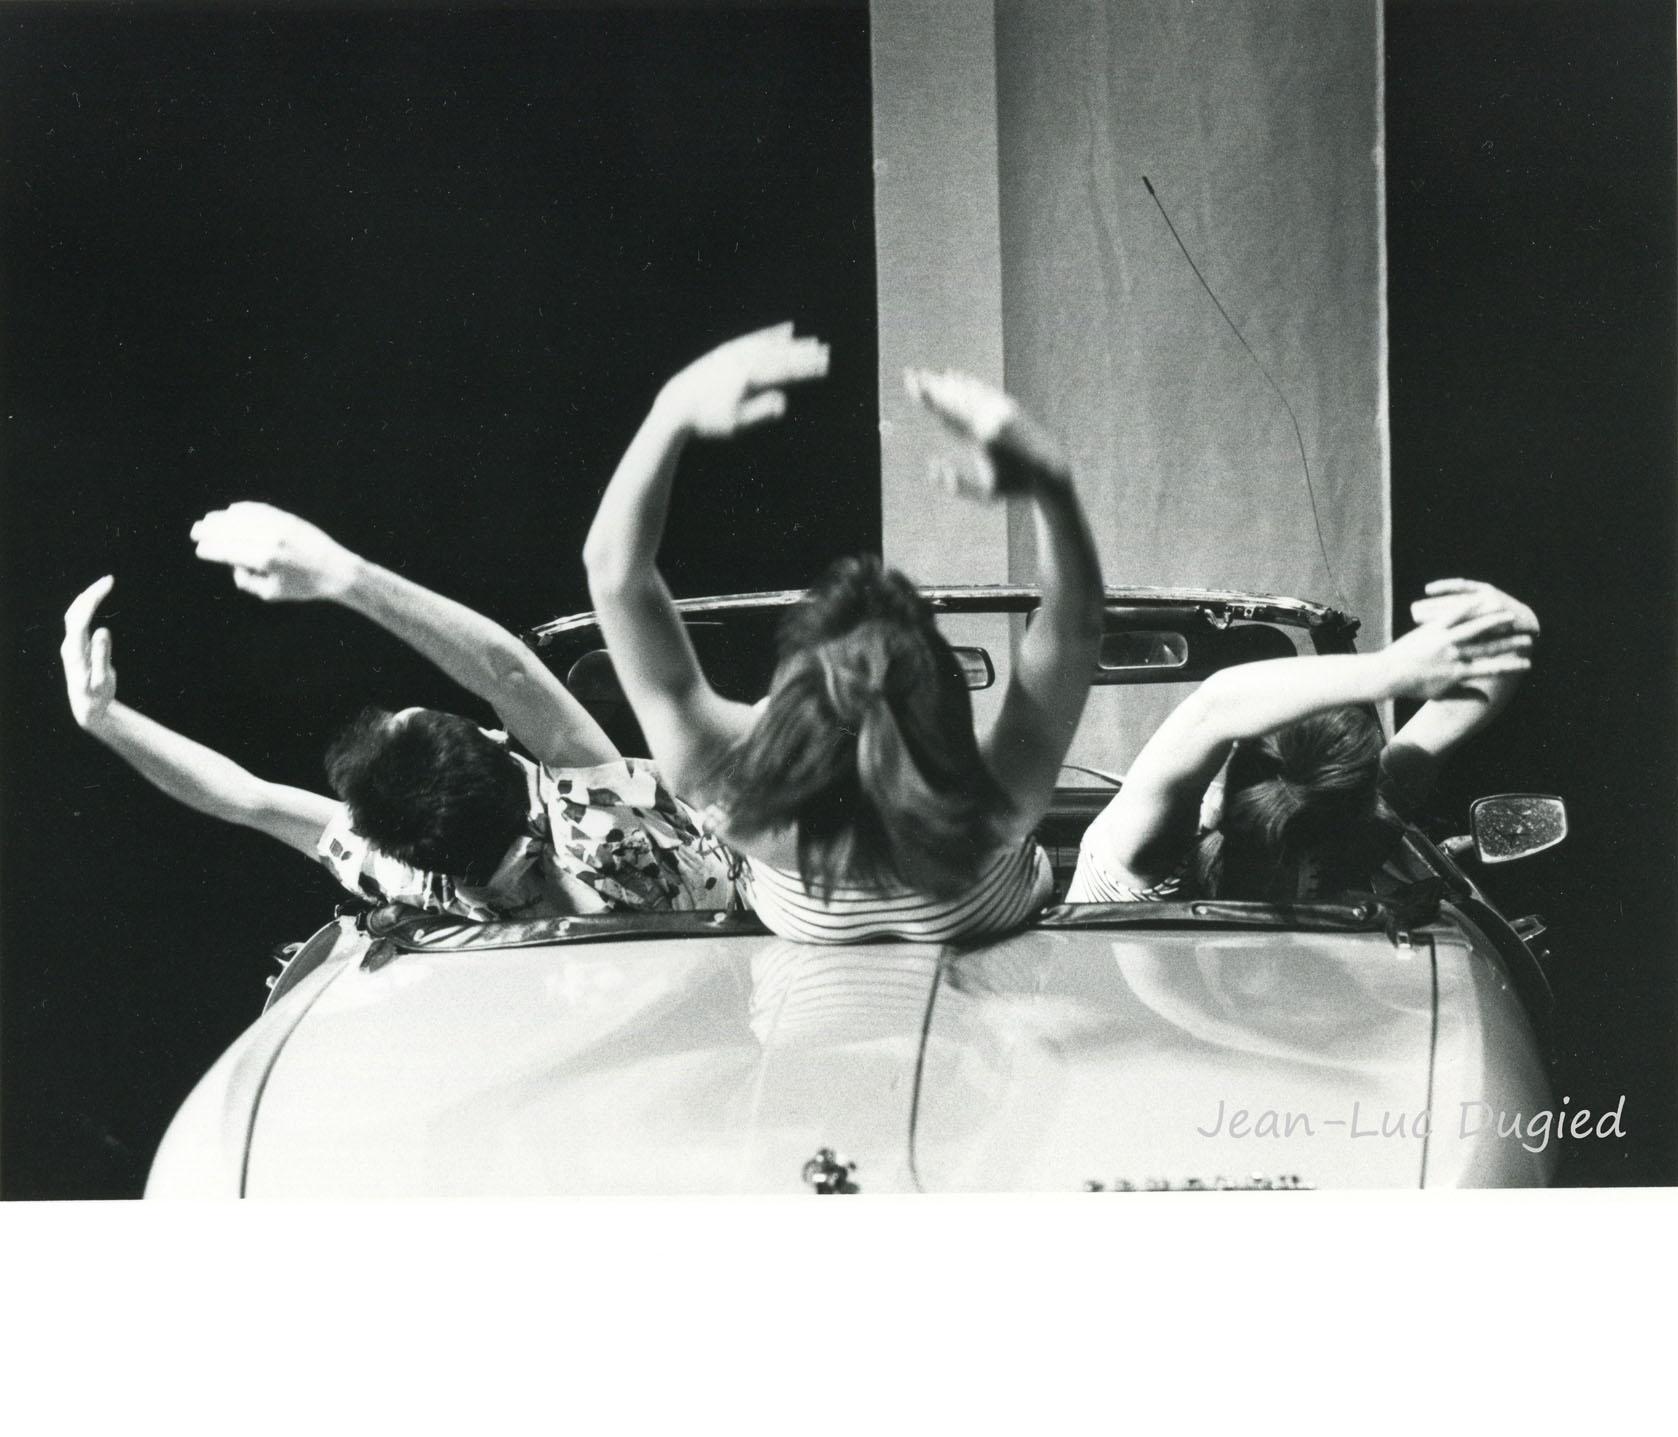 35 Dugied Fabrice - bohème - 1988